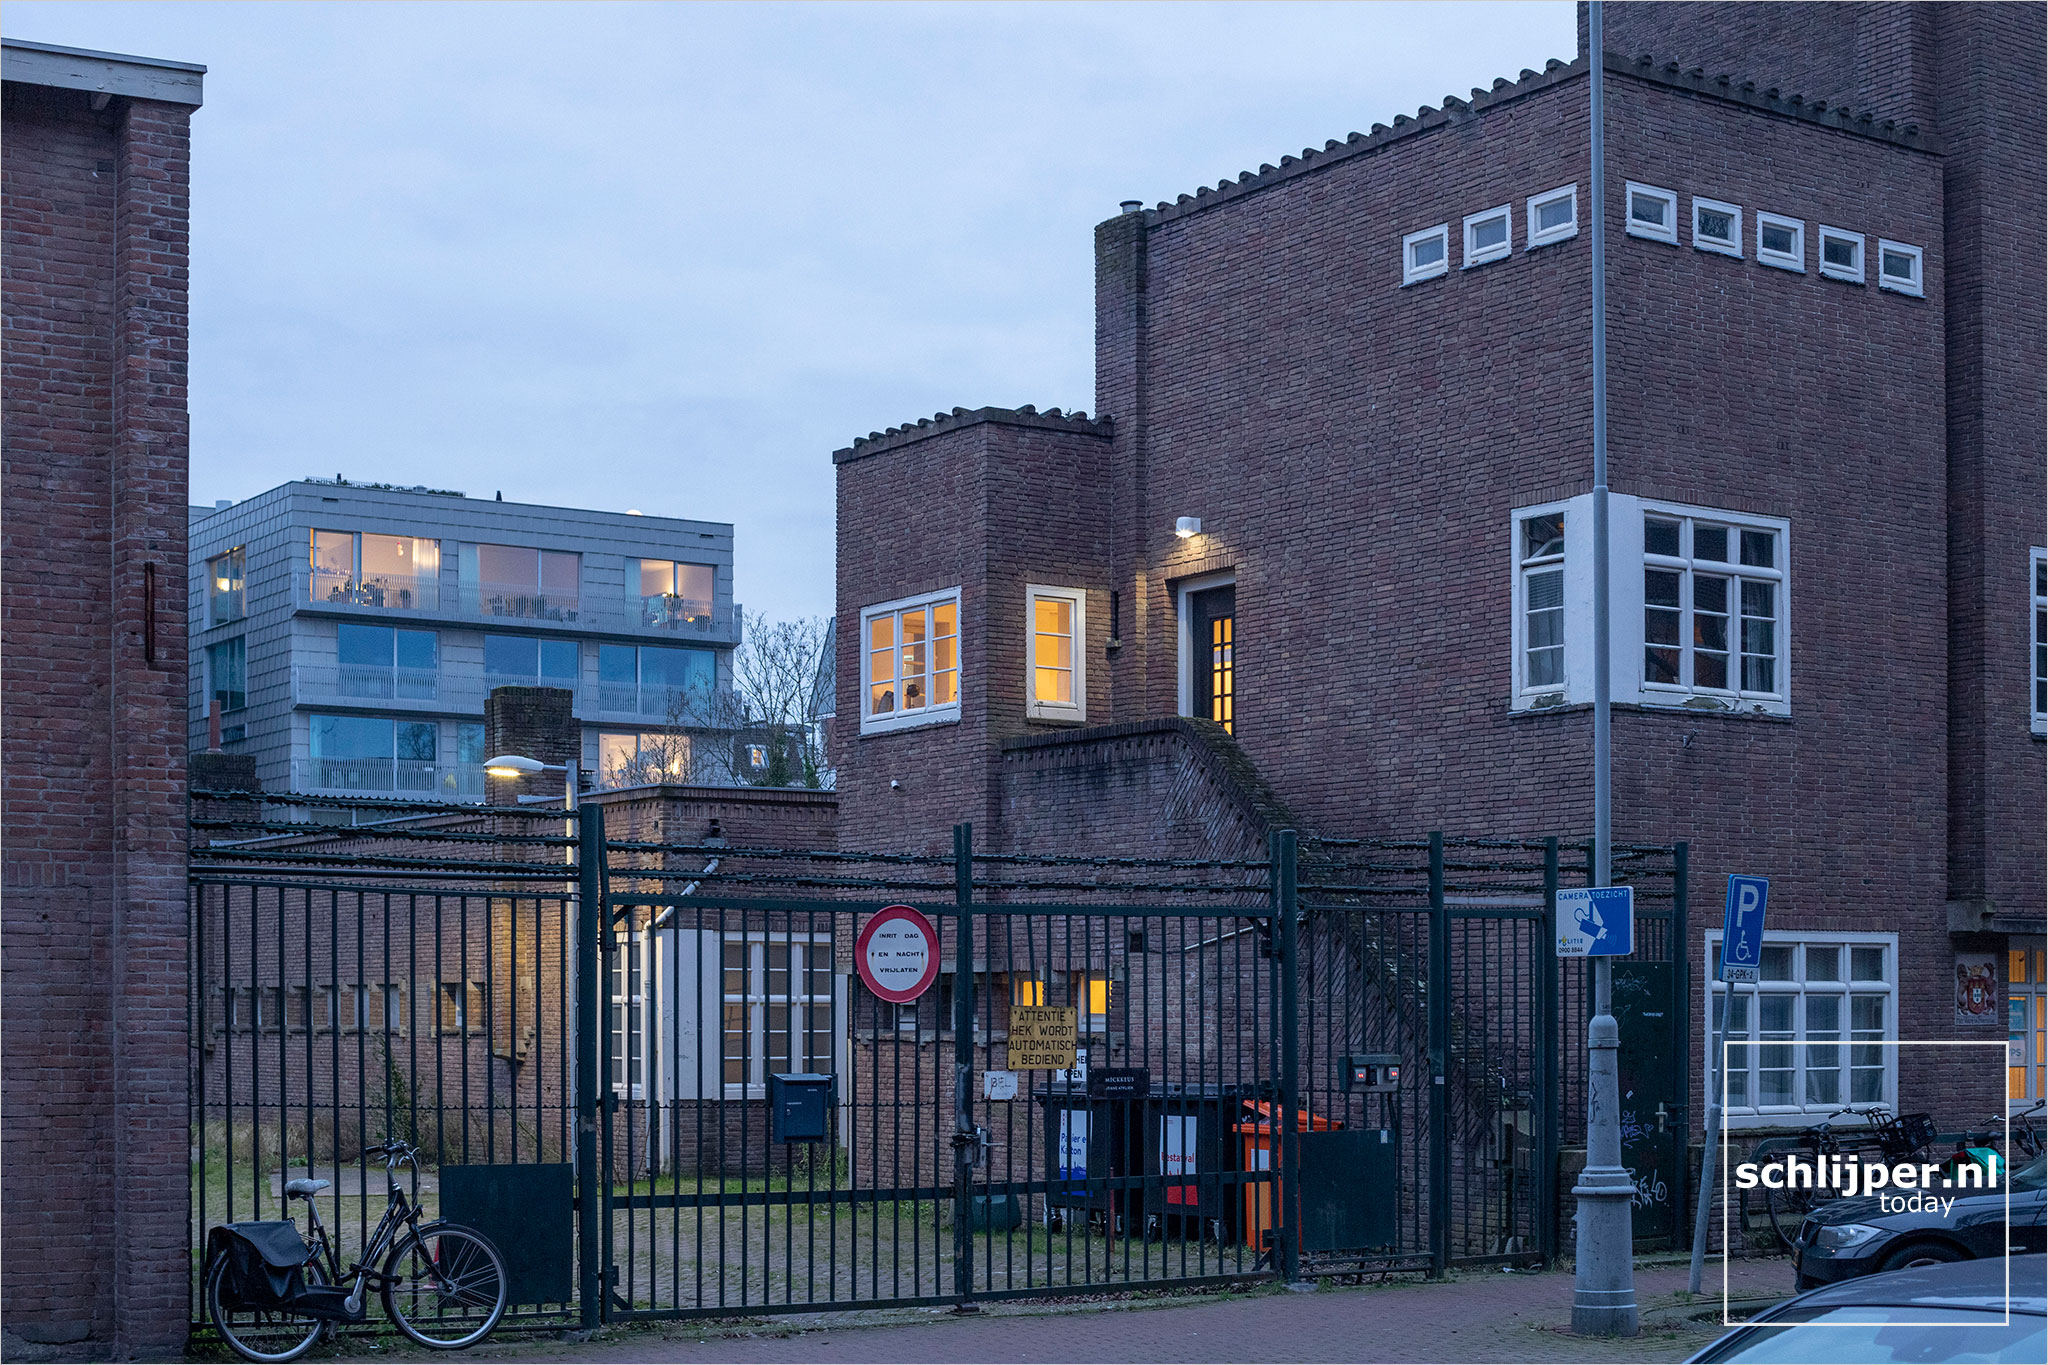 The Netherlands, Amsterdam, 15 januari 2021